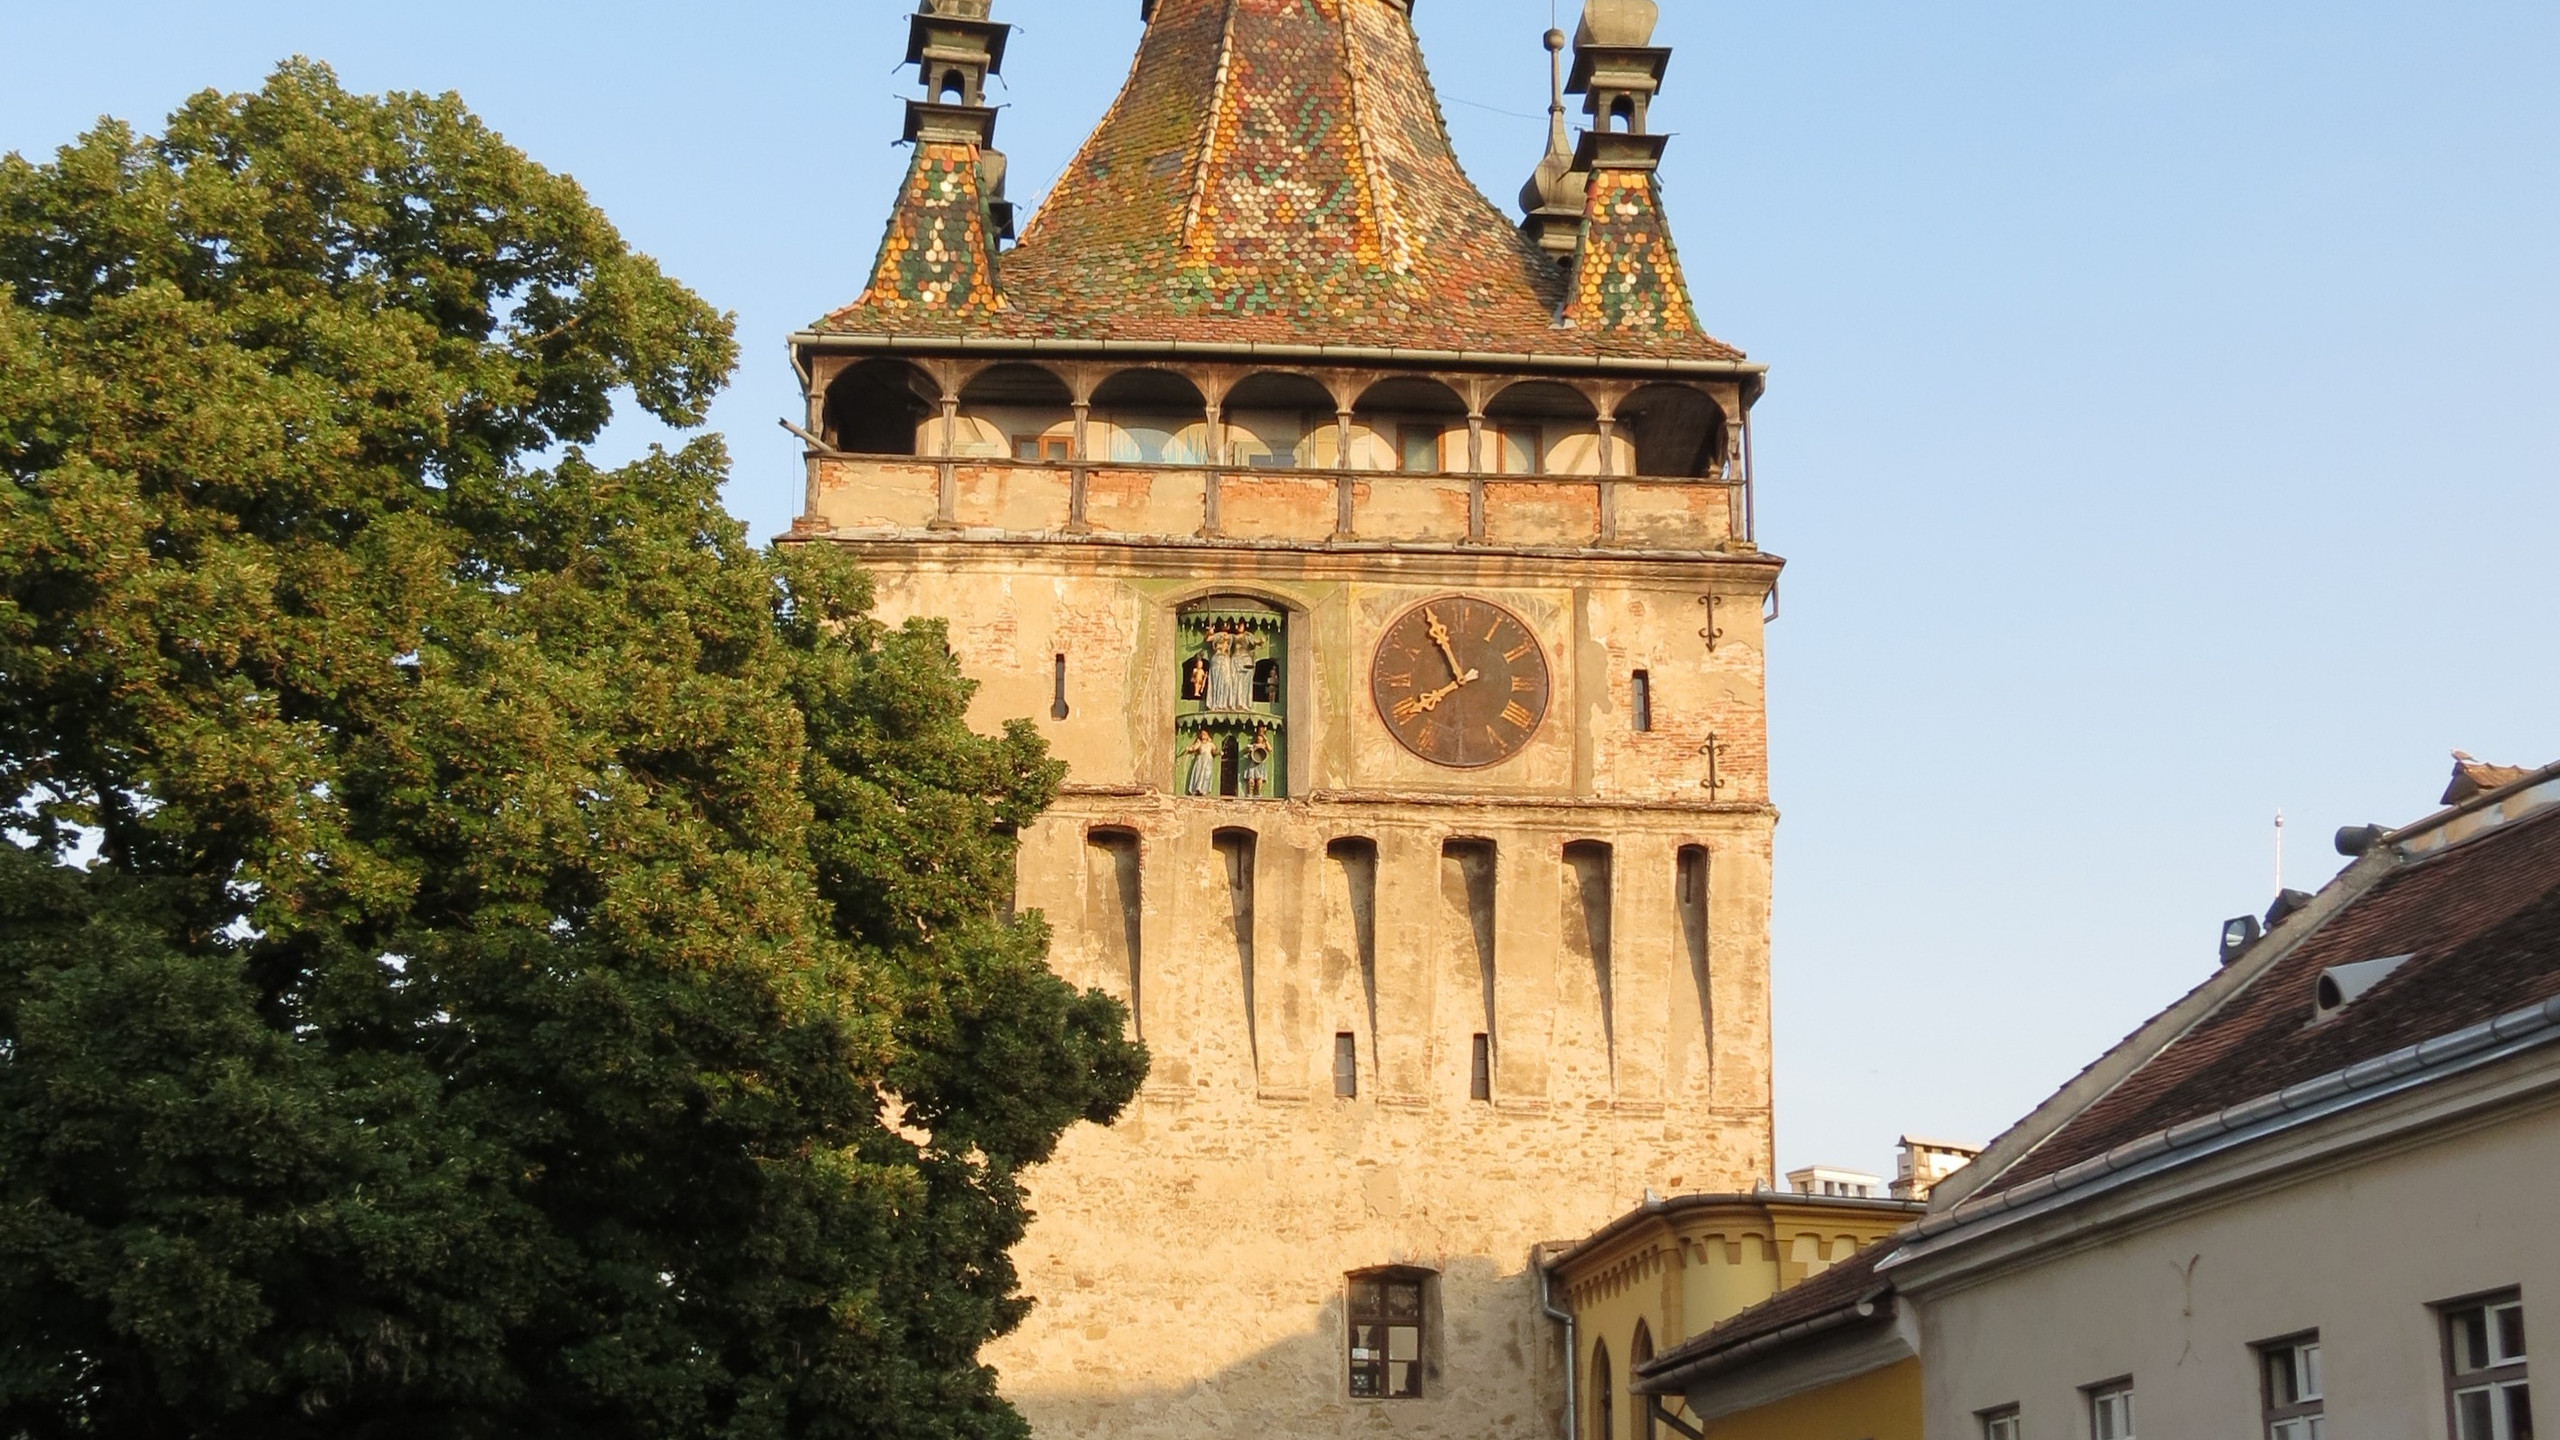 059_-_Sighișoara_clock_tower